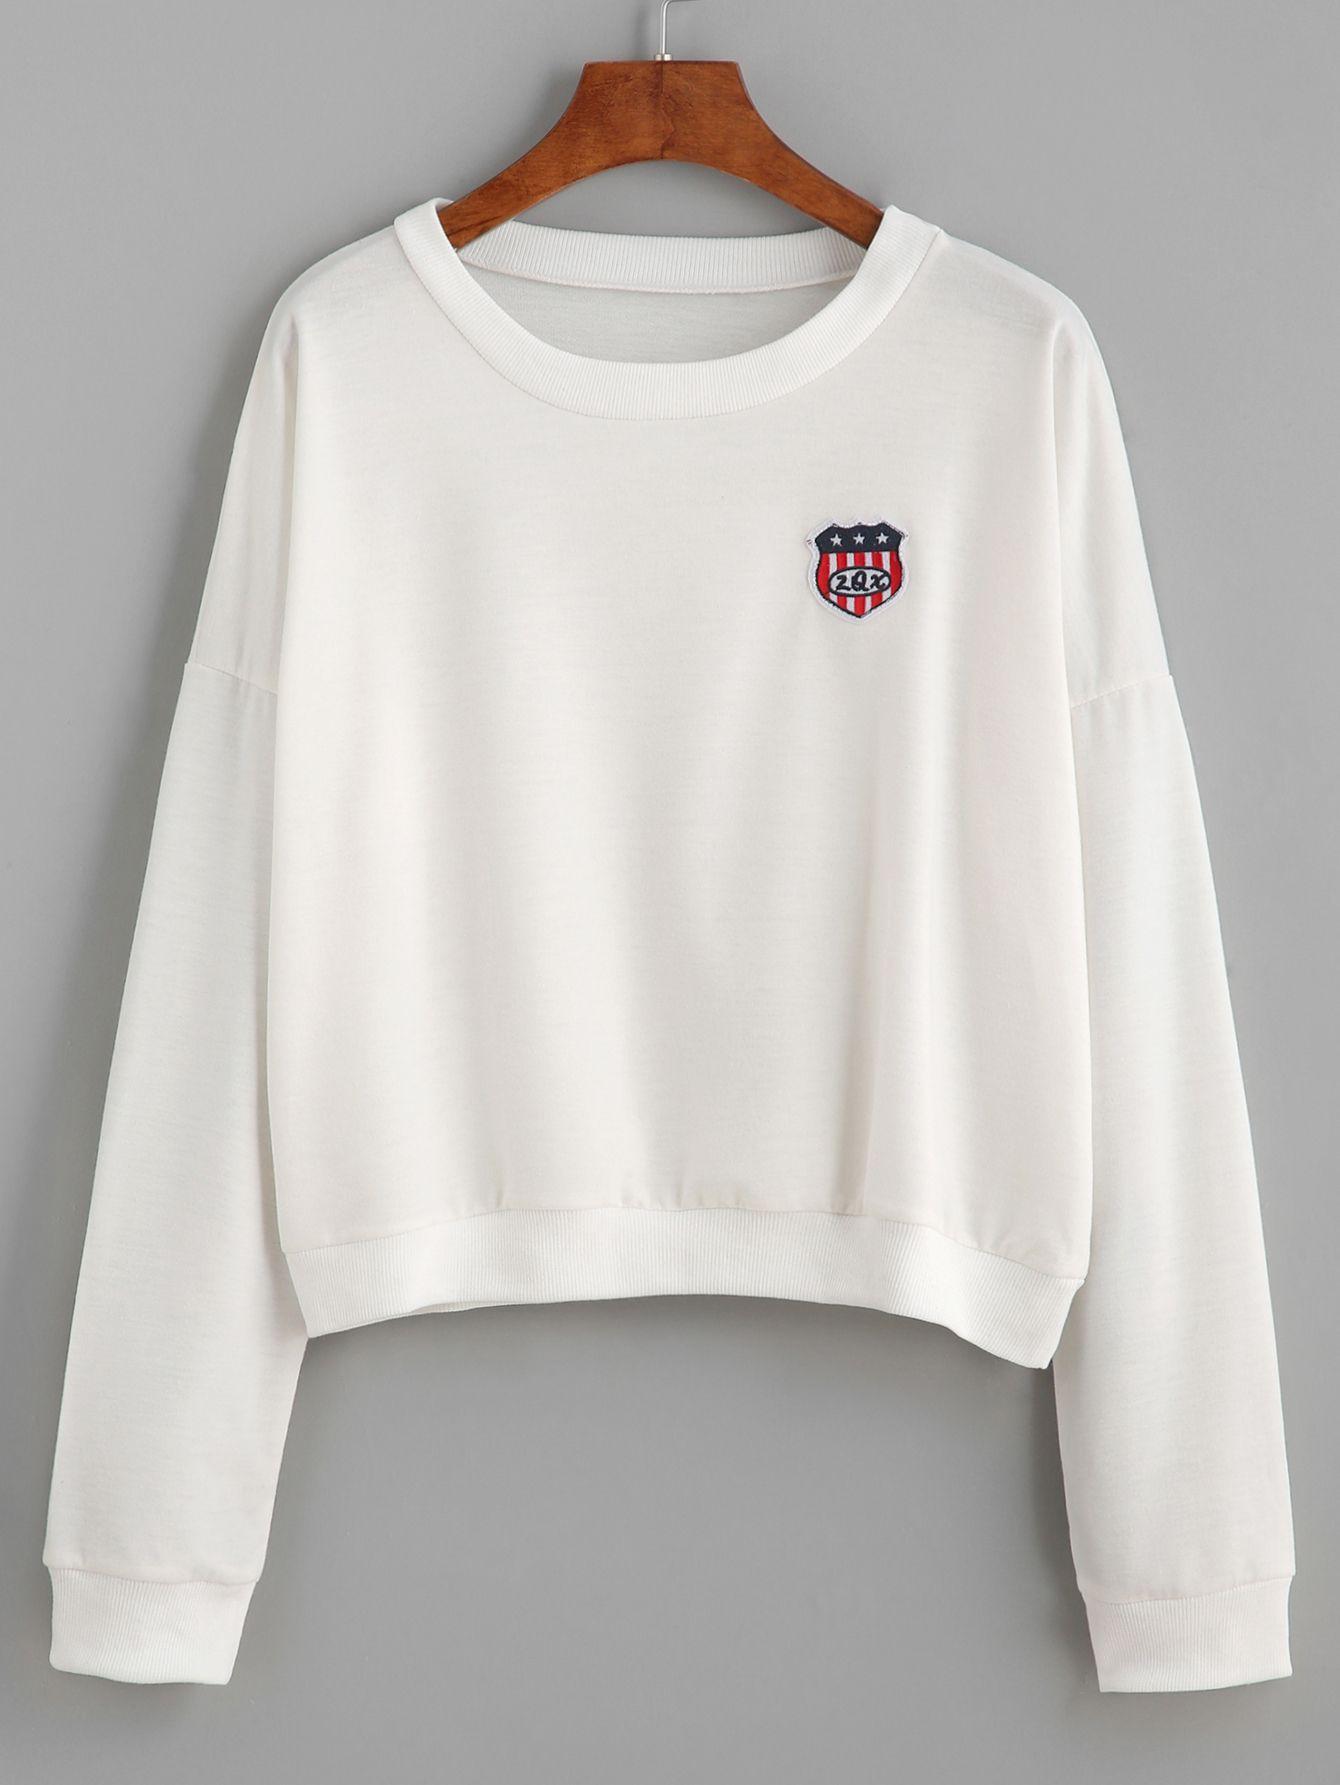 White Drop Shoulder Patch Sweatshirt — 0.00 € -------------------color: White size: one-size